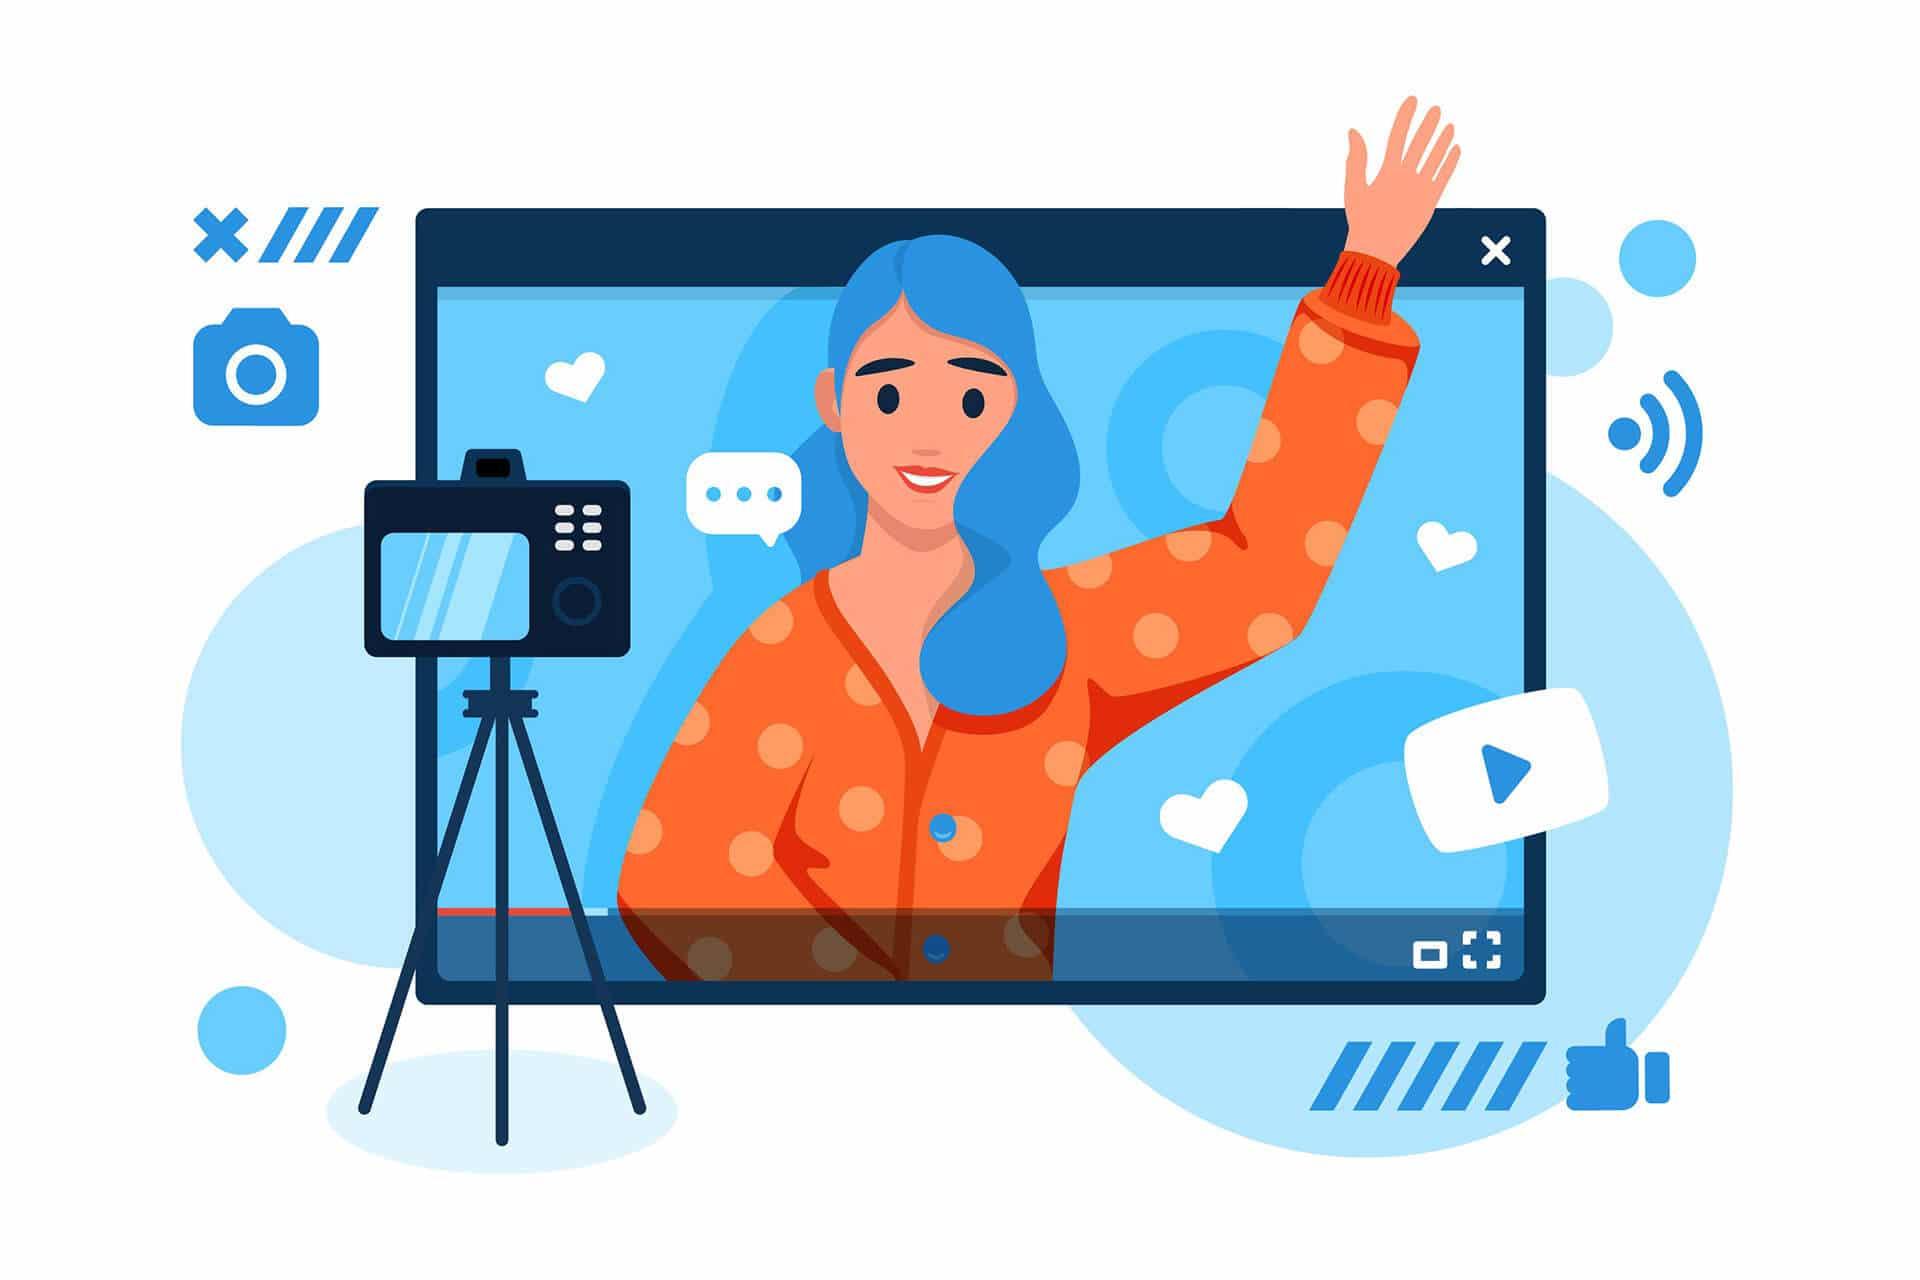 ilustracion mujer haciendo video corporativo